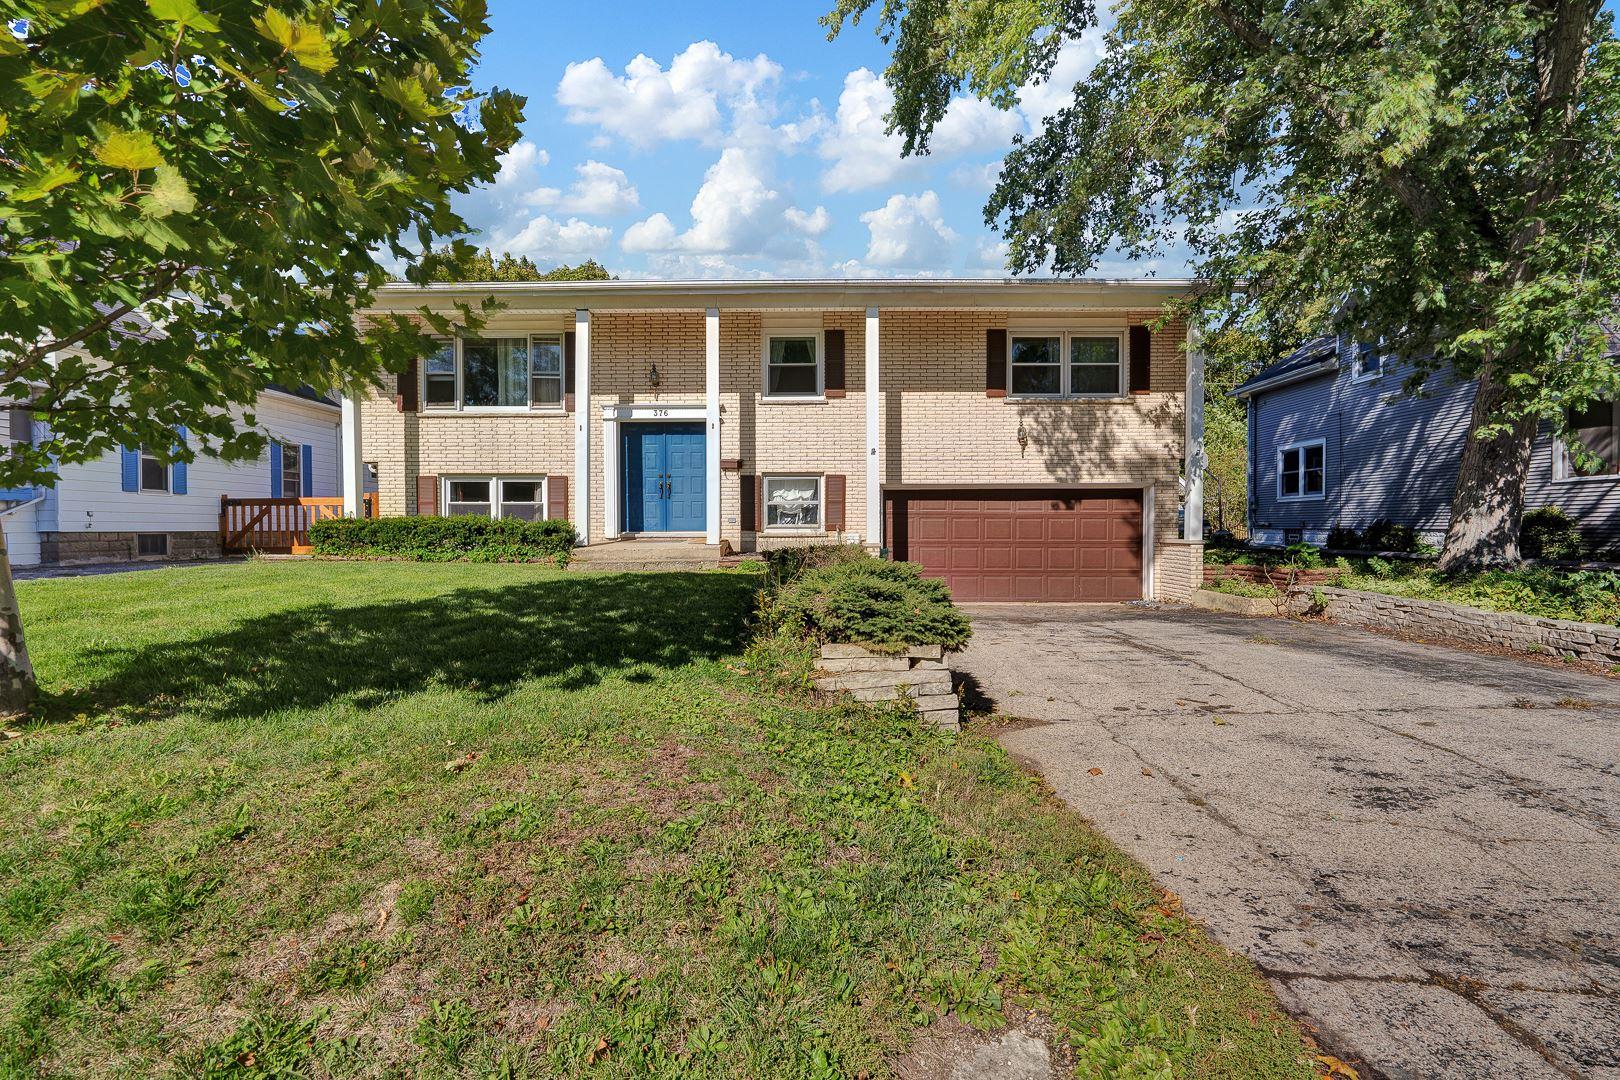 376 Hilkert Court, Crystal Lake, IL 60014 - #: 10894899